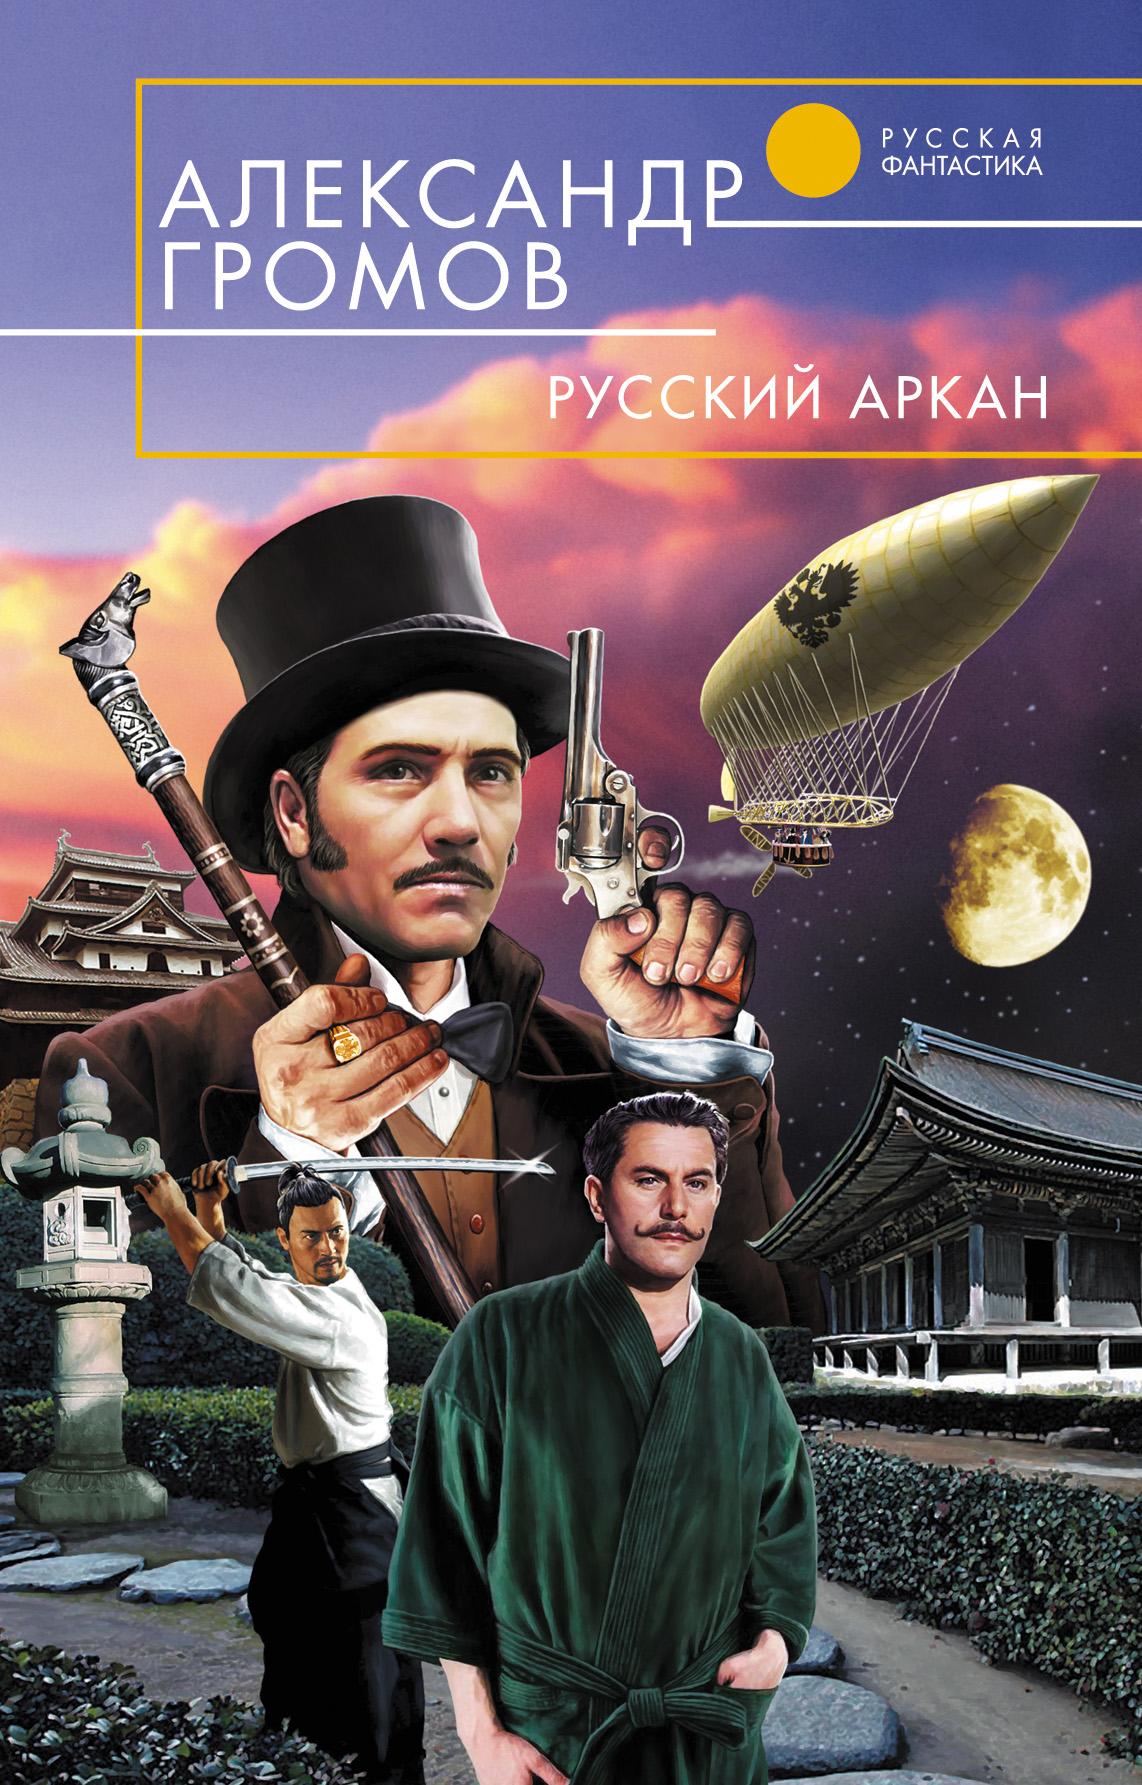 Русский аркан